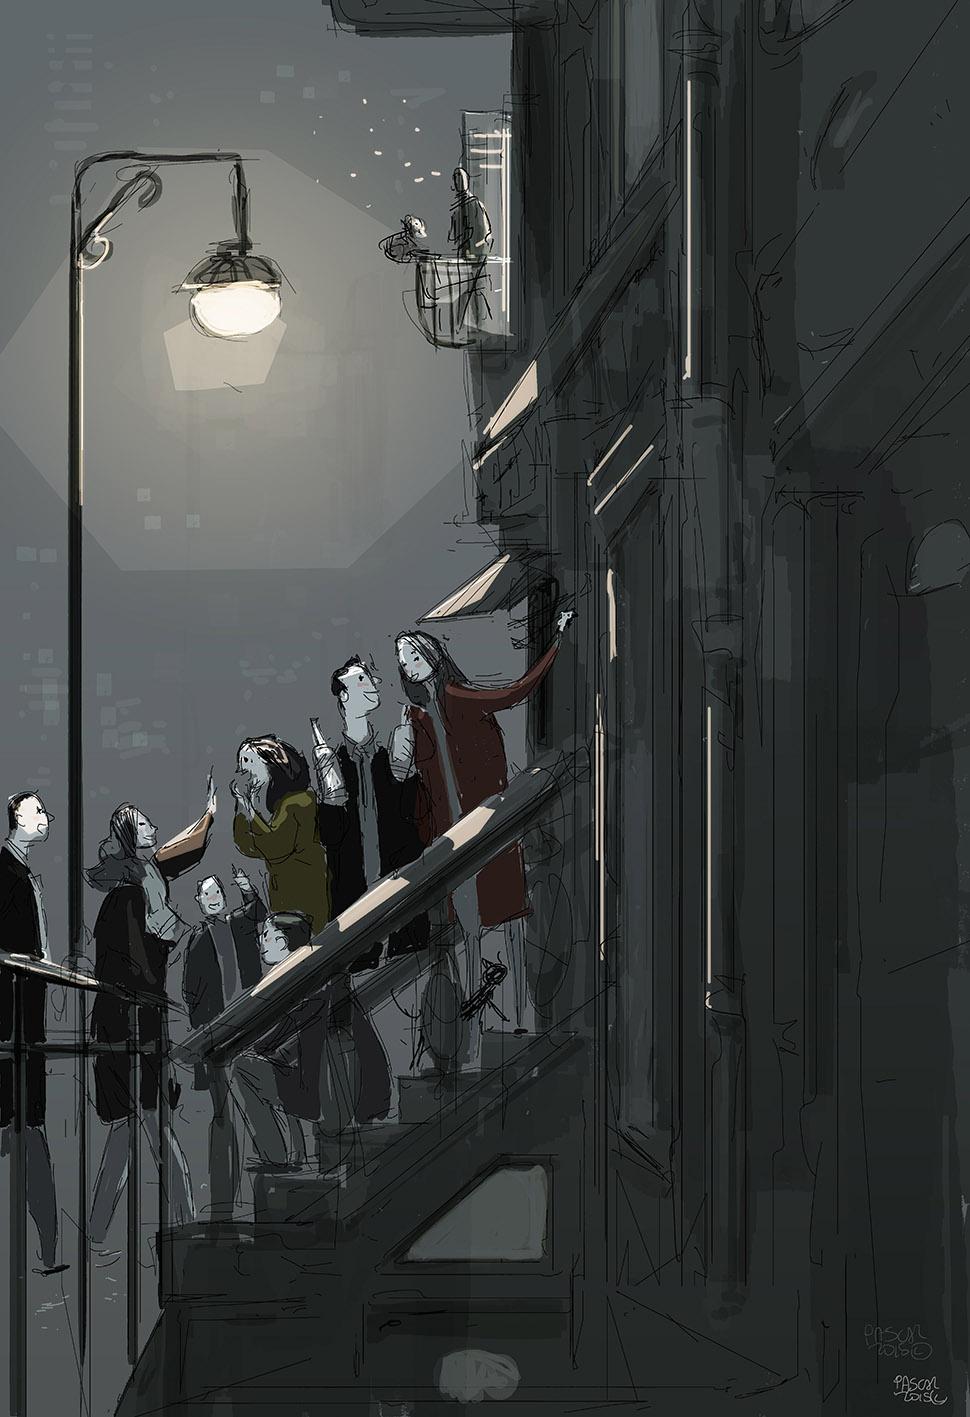 Night Life sketch by PascalCampion on DeviantArt